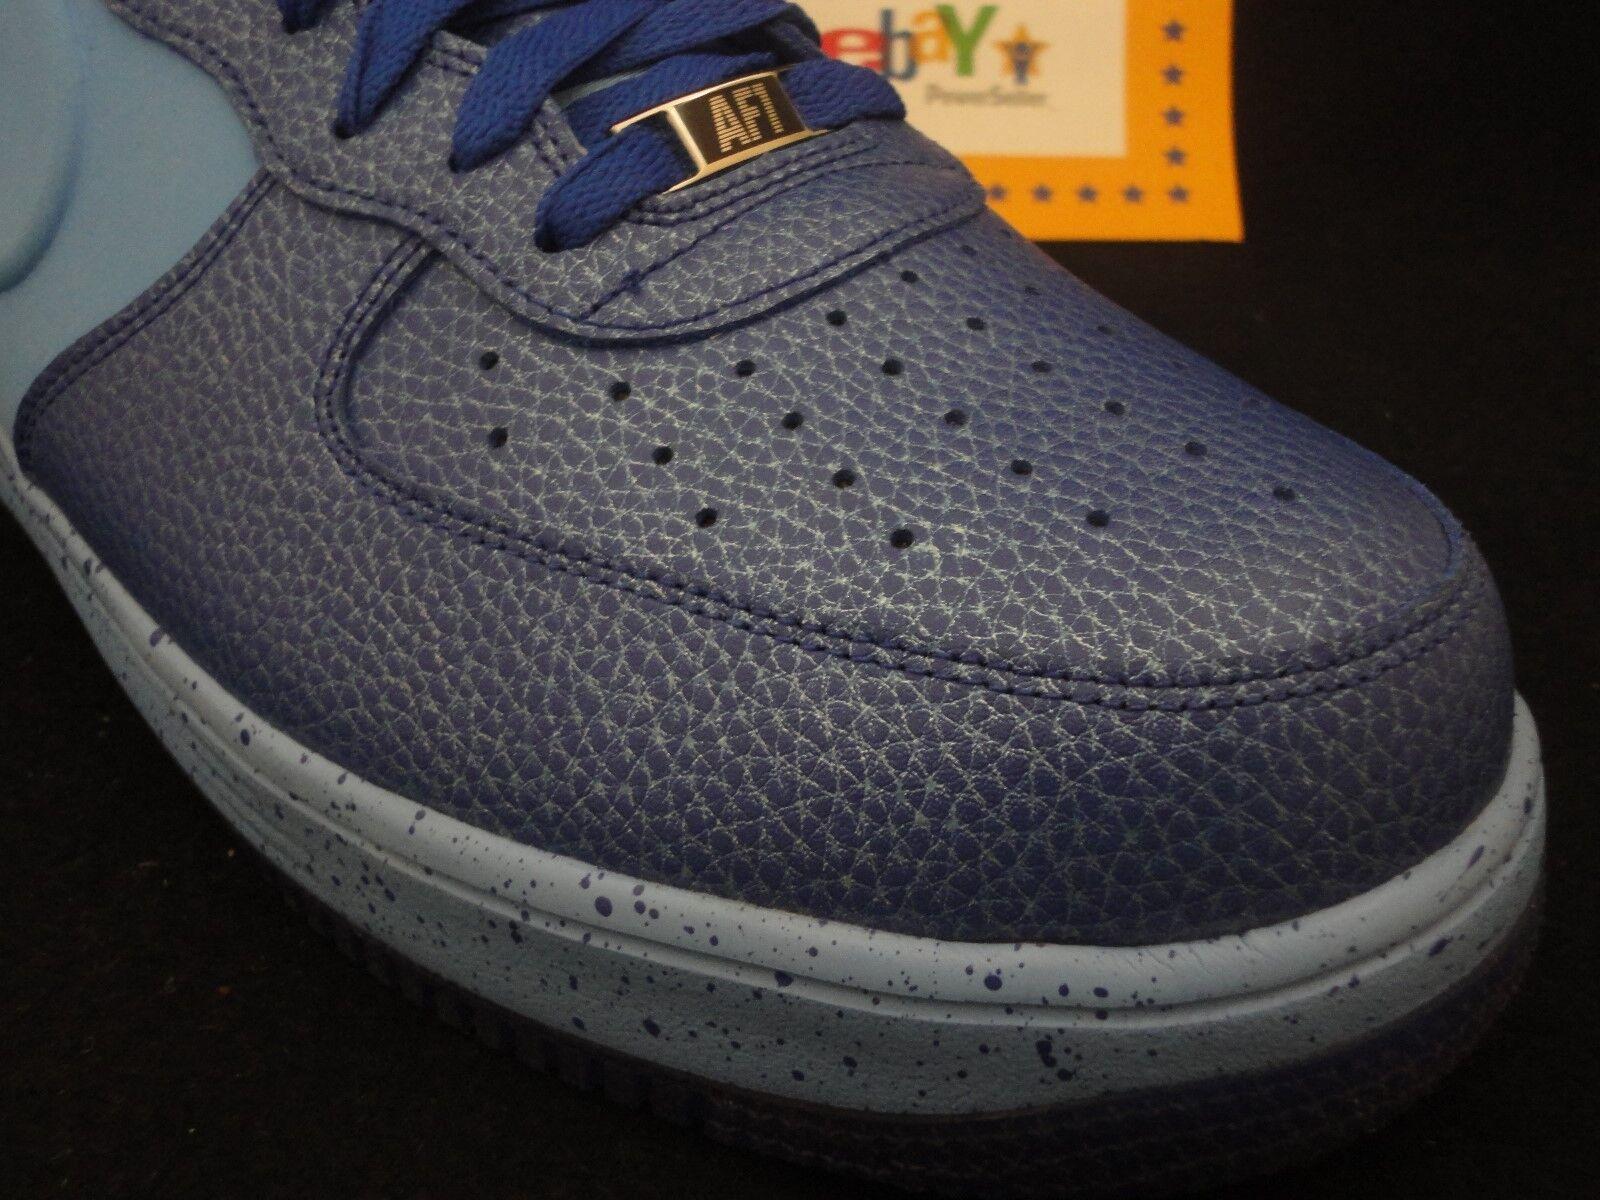 Nike Lunar Force 1 Lux VT, Game Royal / University Blue, Sz 14